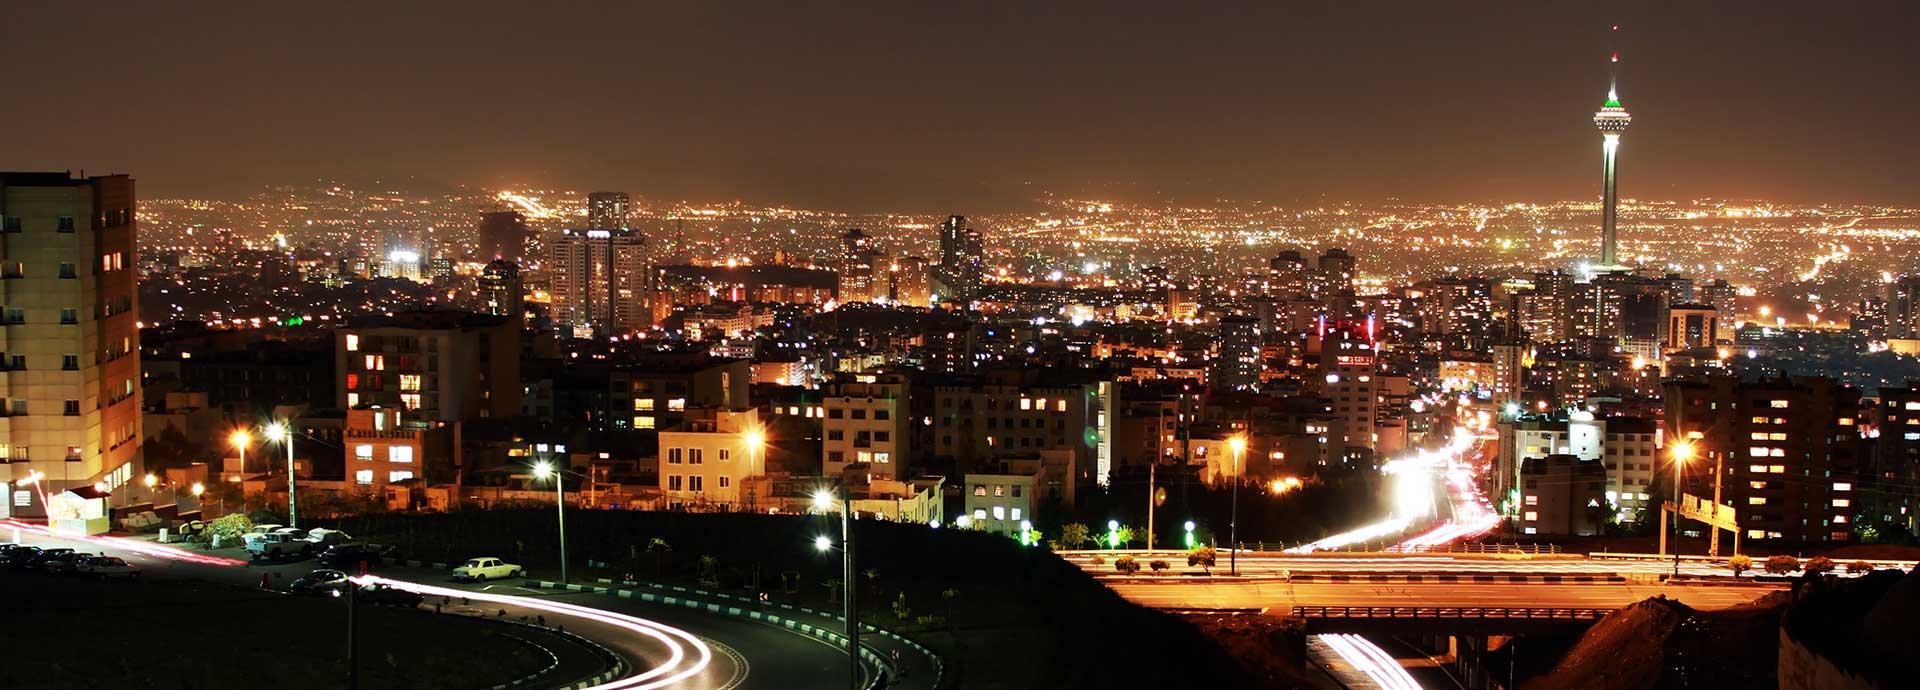 tehran skyline at night